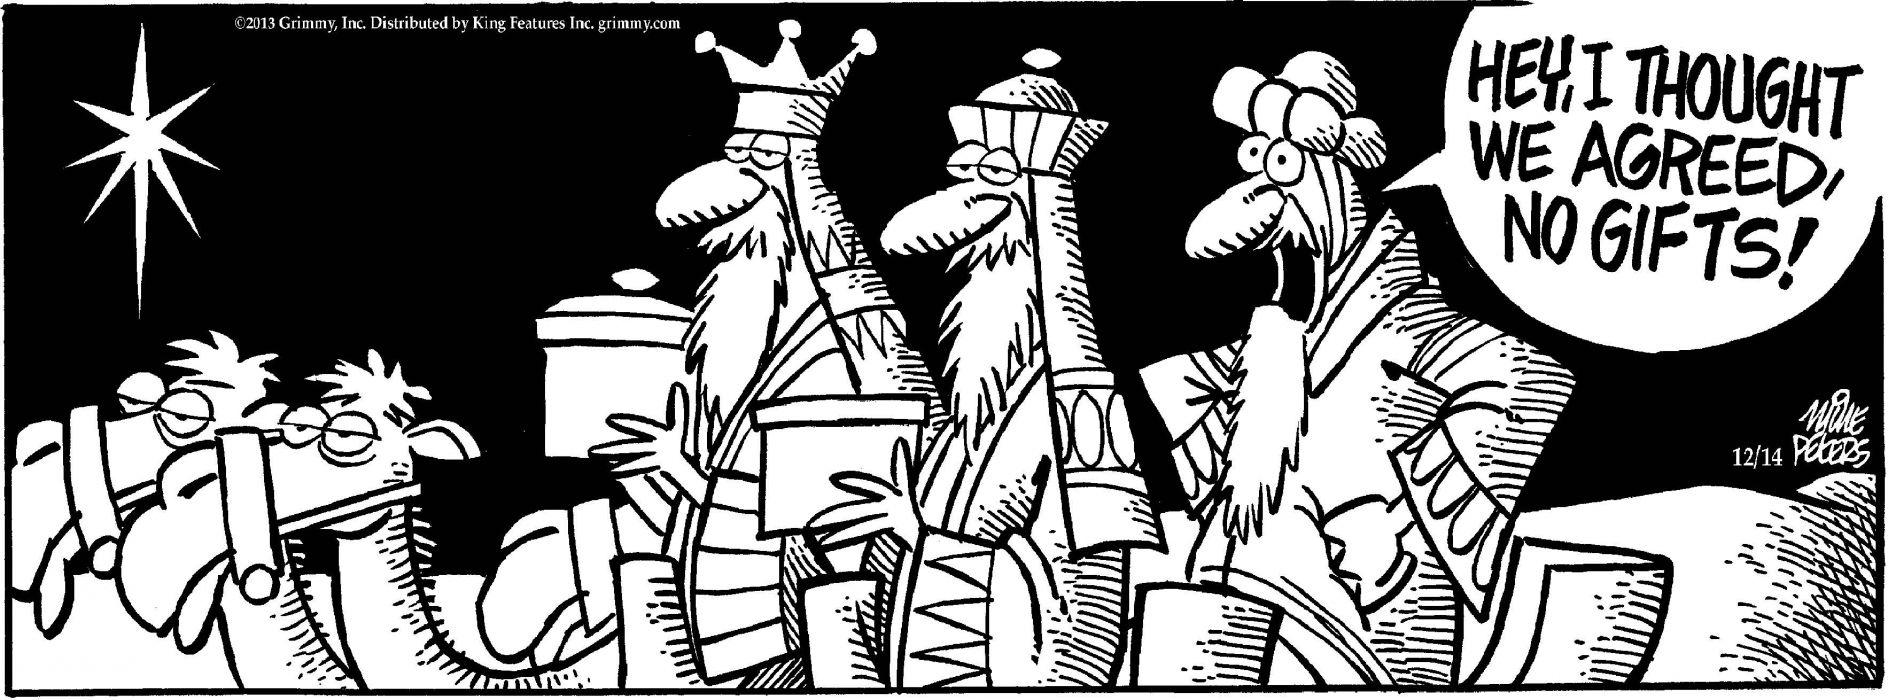 MOTHER-GOOSE-AND-GRIM mother goose grim funny humor comicstrip (45) wallpaper